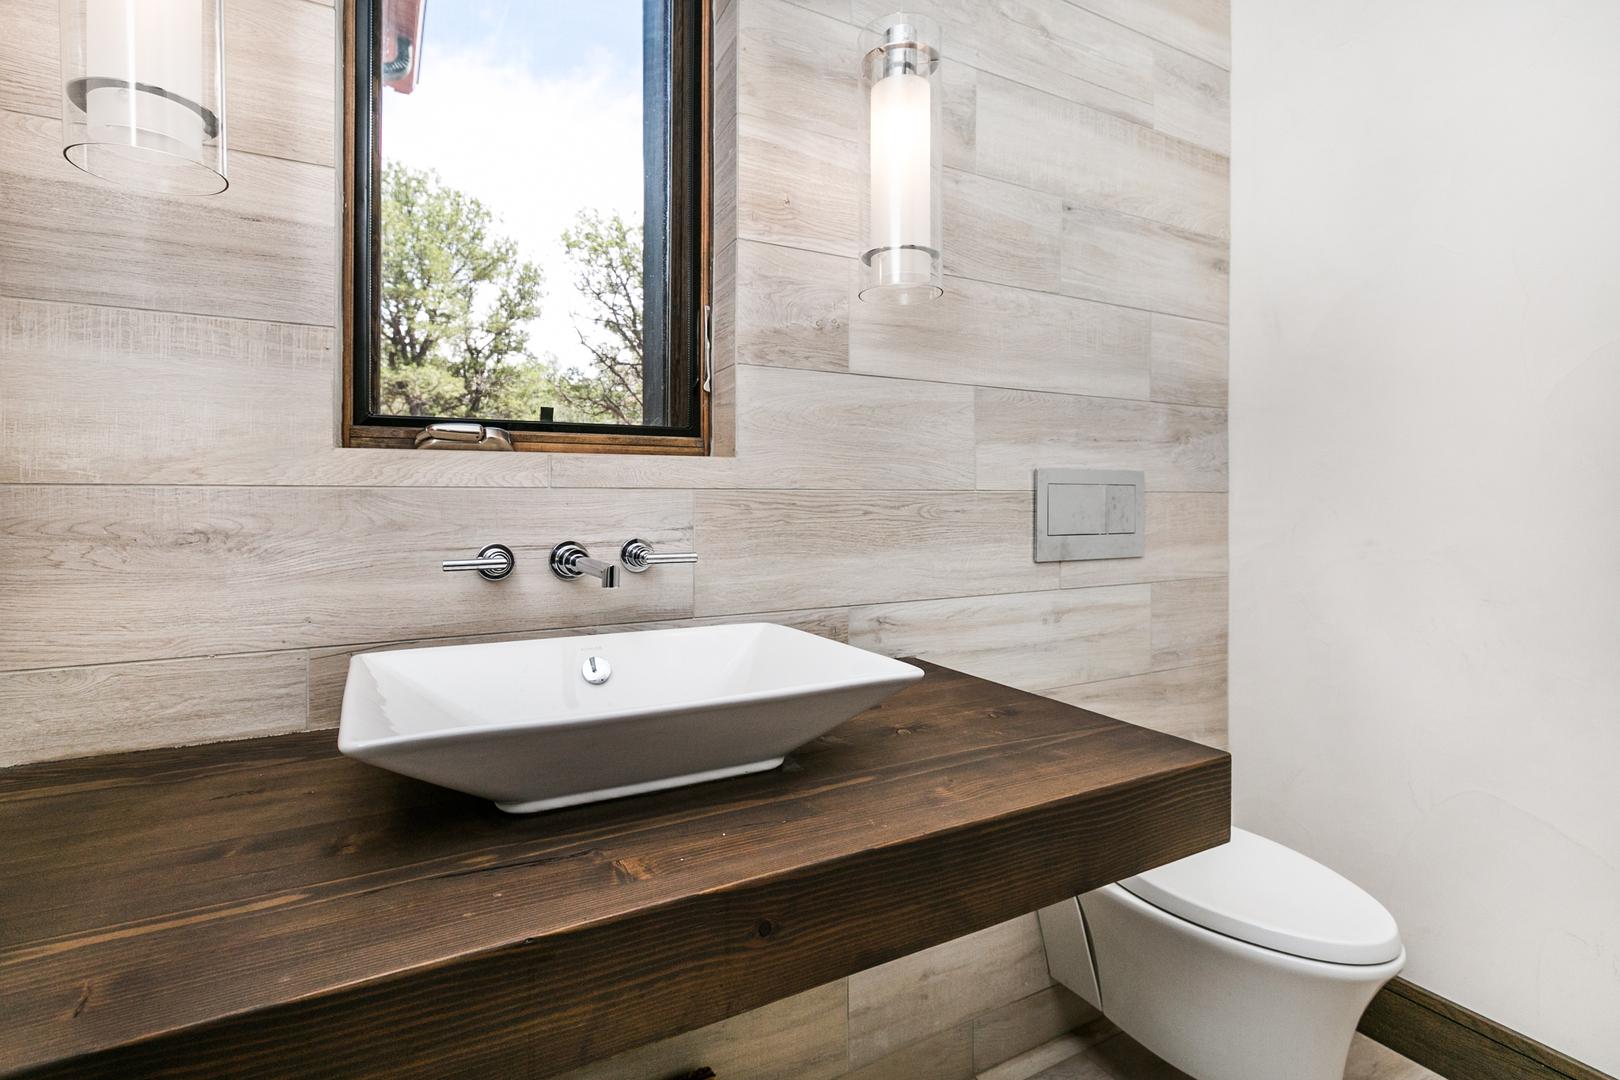 Bathroom Remodeling Albuquerque bathroom remodel - albuquerque - more brothers construction